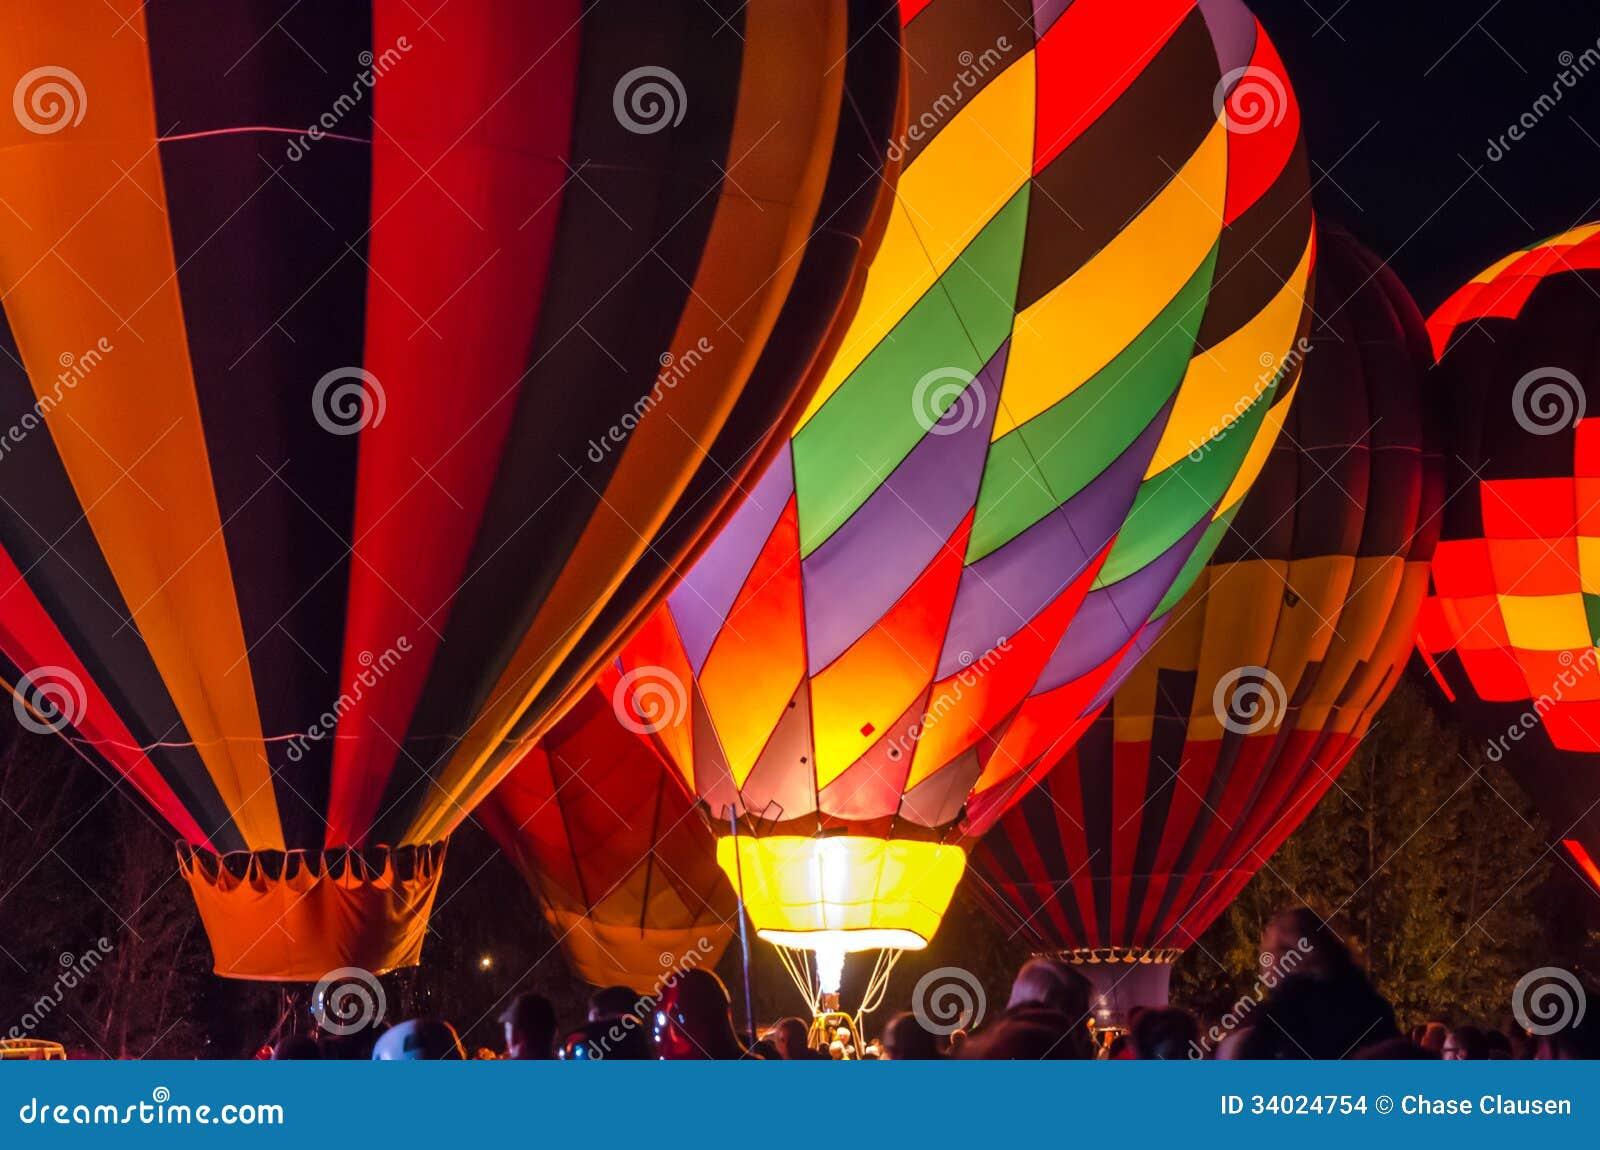 Bright Hot Air Balloons Glowing At Night Stock Images ...